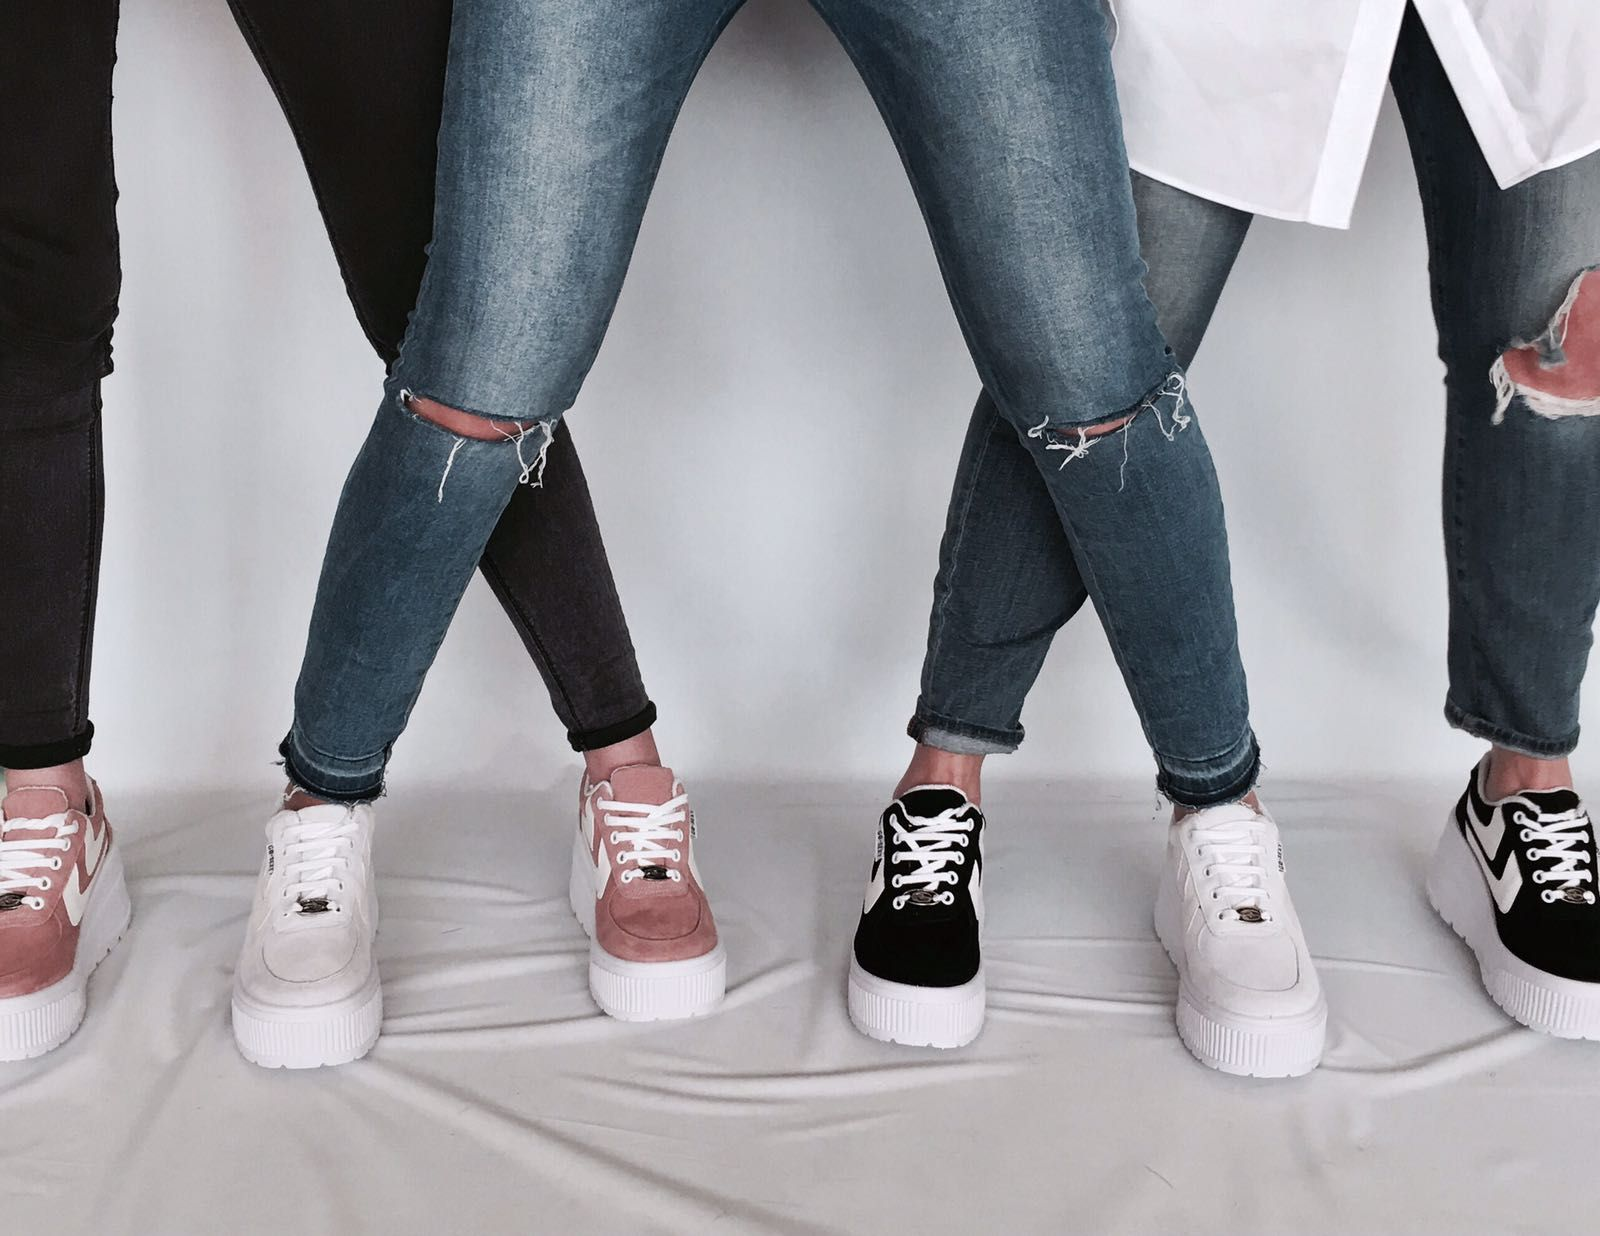 new style 56016 4a952  Deportivas Go Sexy Surwave de plataforma de máxima tendencia, perfectas  para combinar con jeans ripped o minis para un efecto de piernas infinitas!